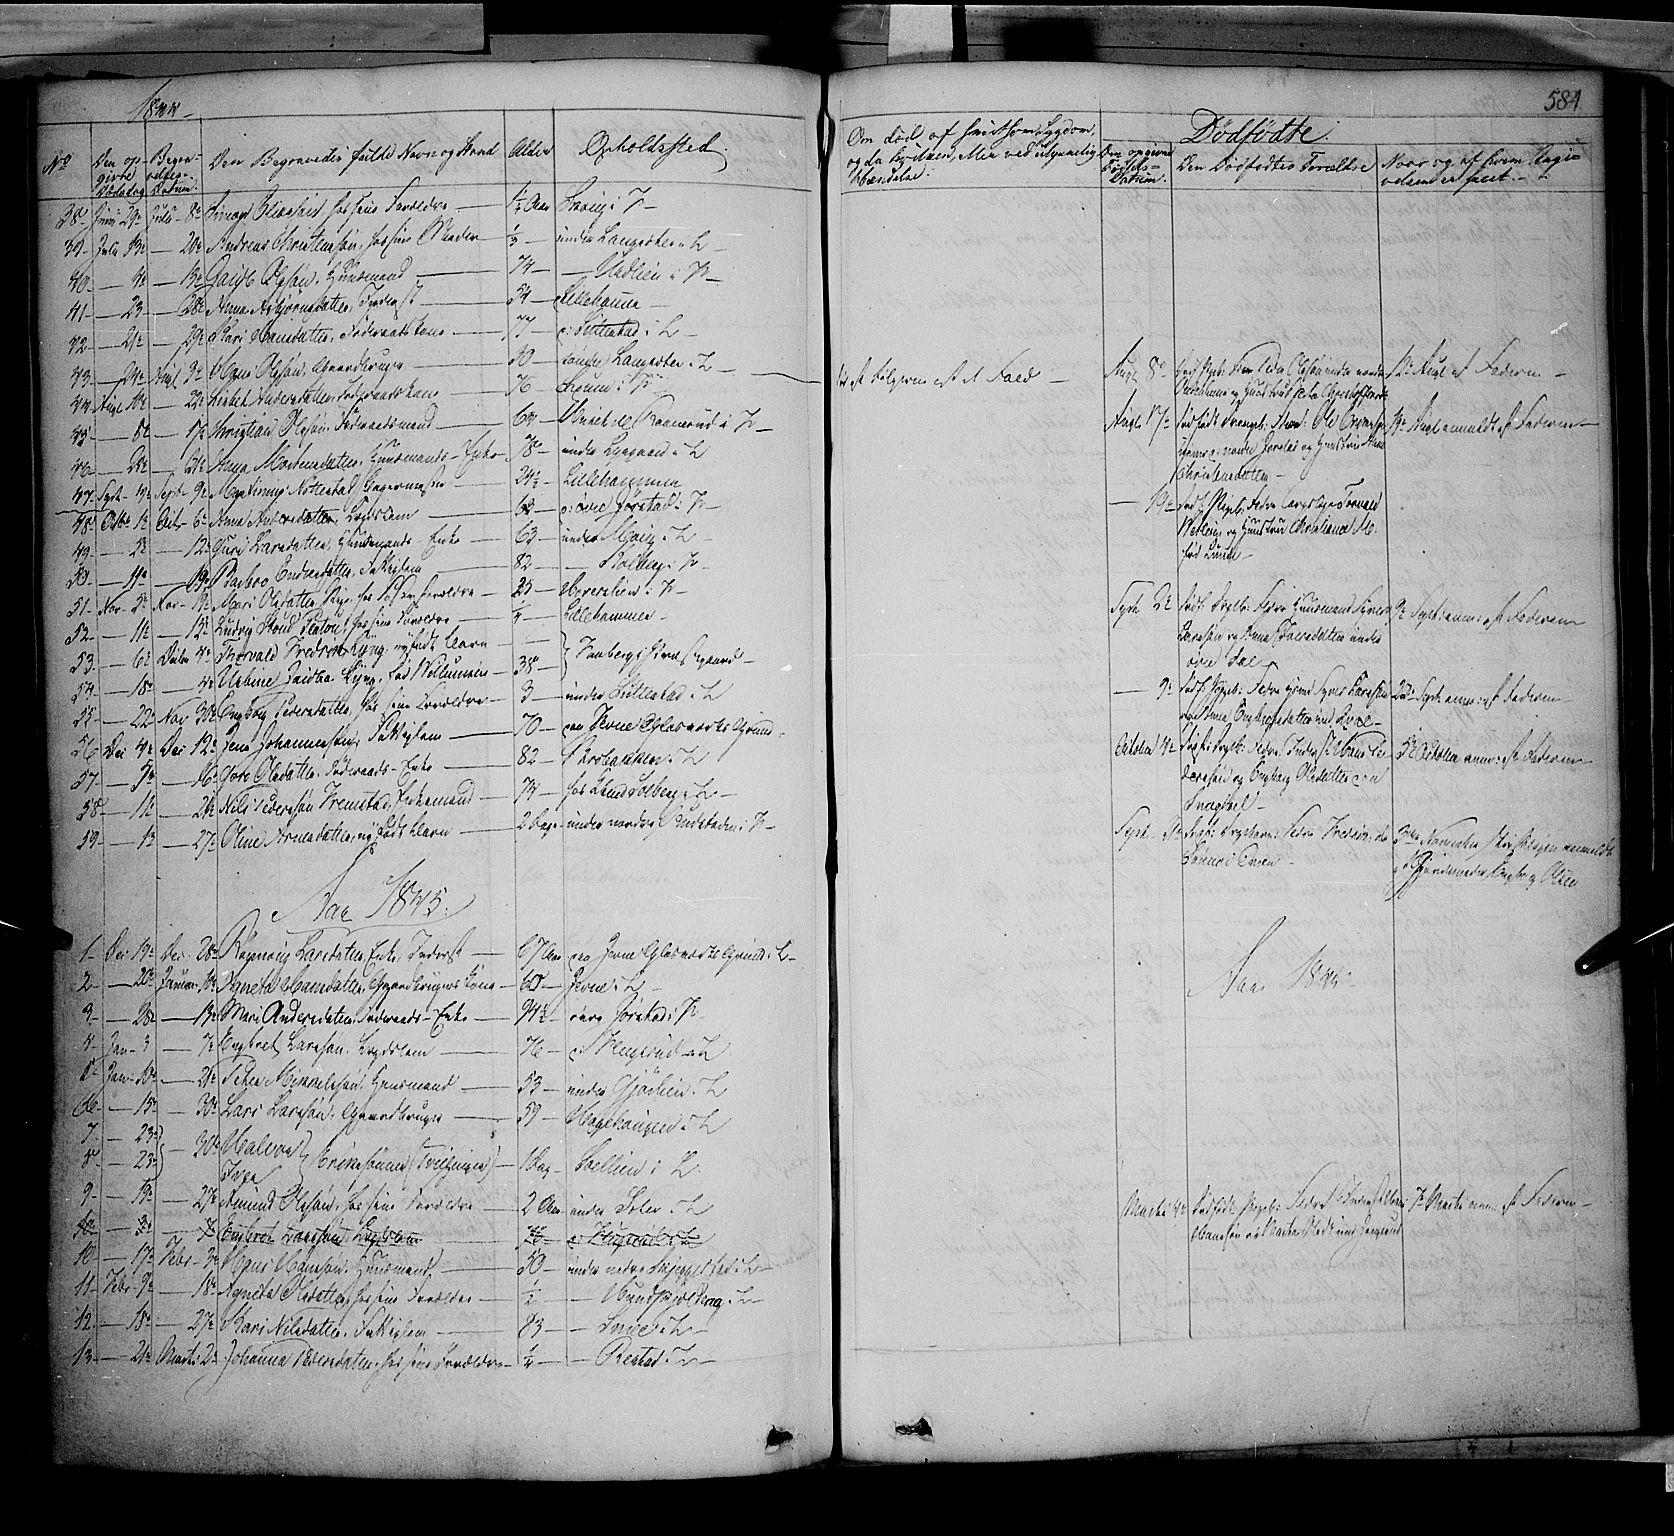 SAH, Fåberg prestekontor, Ministerialbok nr. 5, 1836-1854, s. 583-584